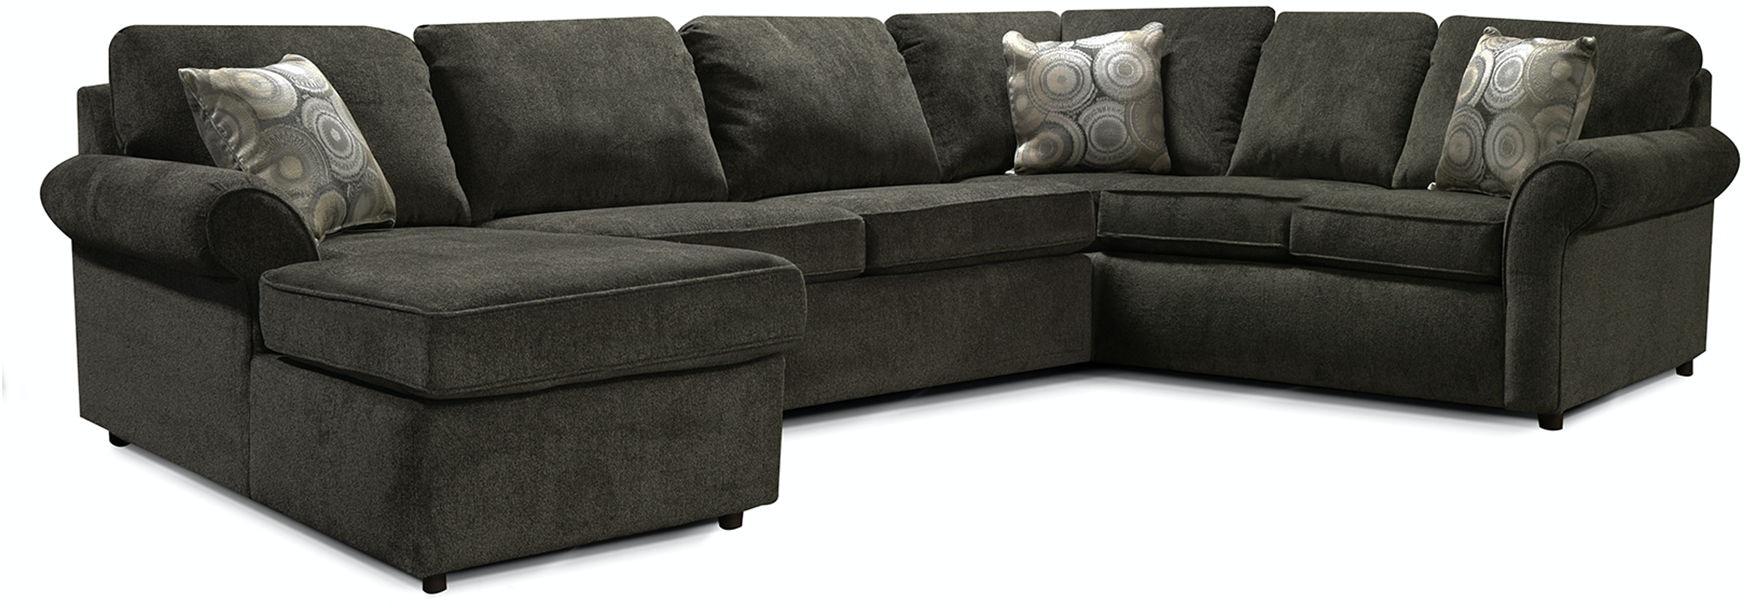 England Living Room Malibu Sectional 2400 Sect England Furniture